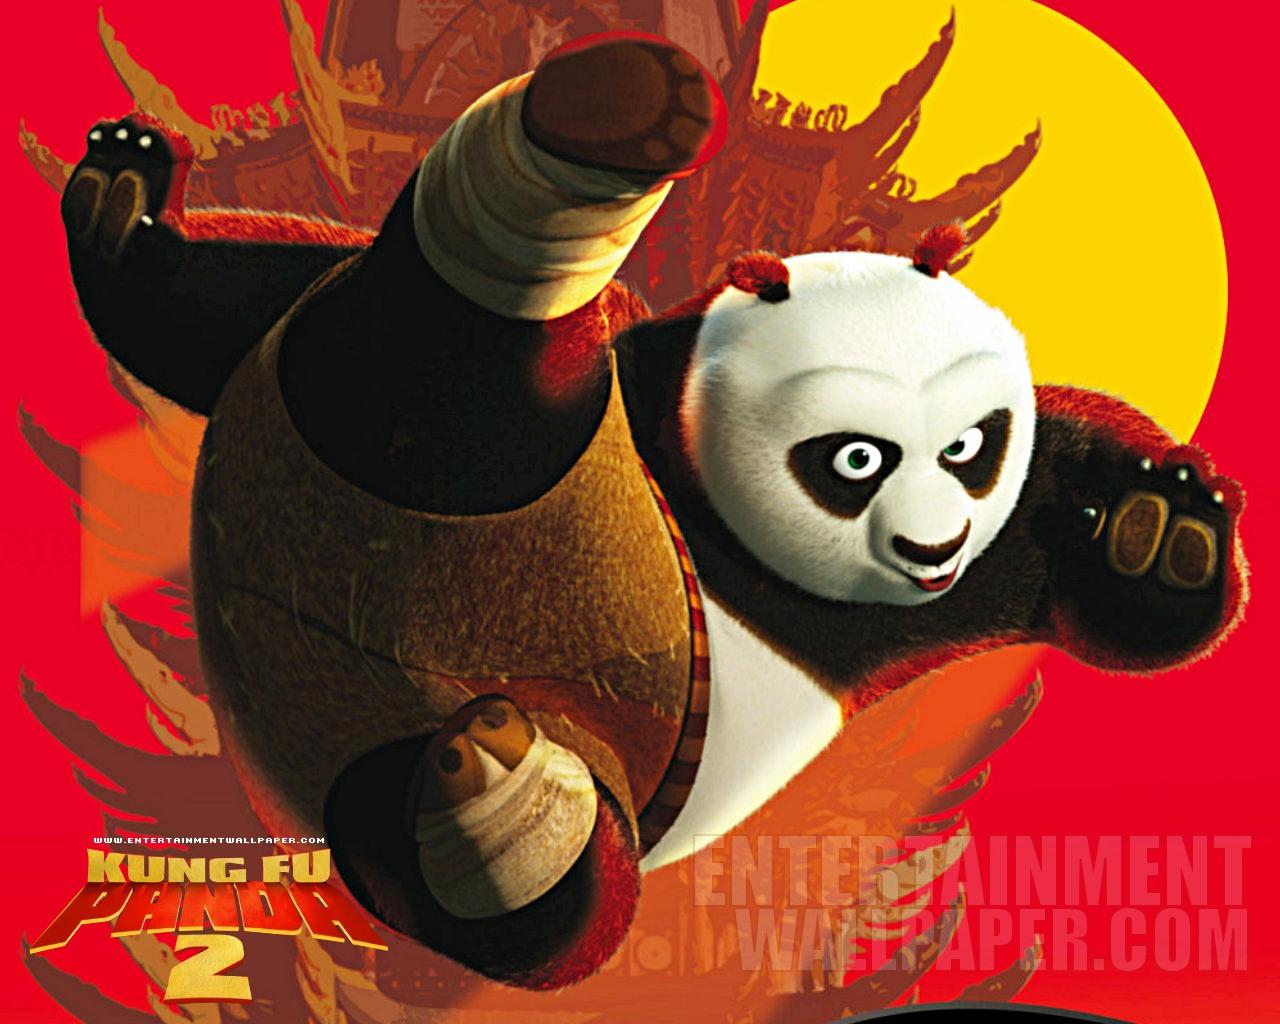 Free Download Kung Fu Panda 2 Wallpaper Page 3 1280x1024 For